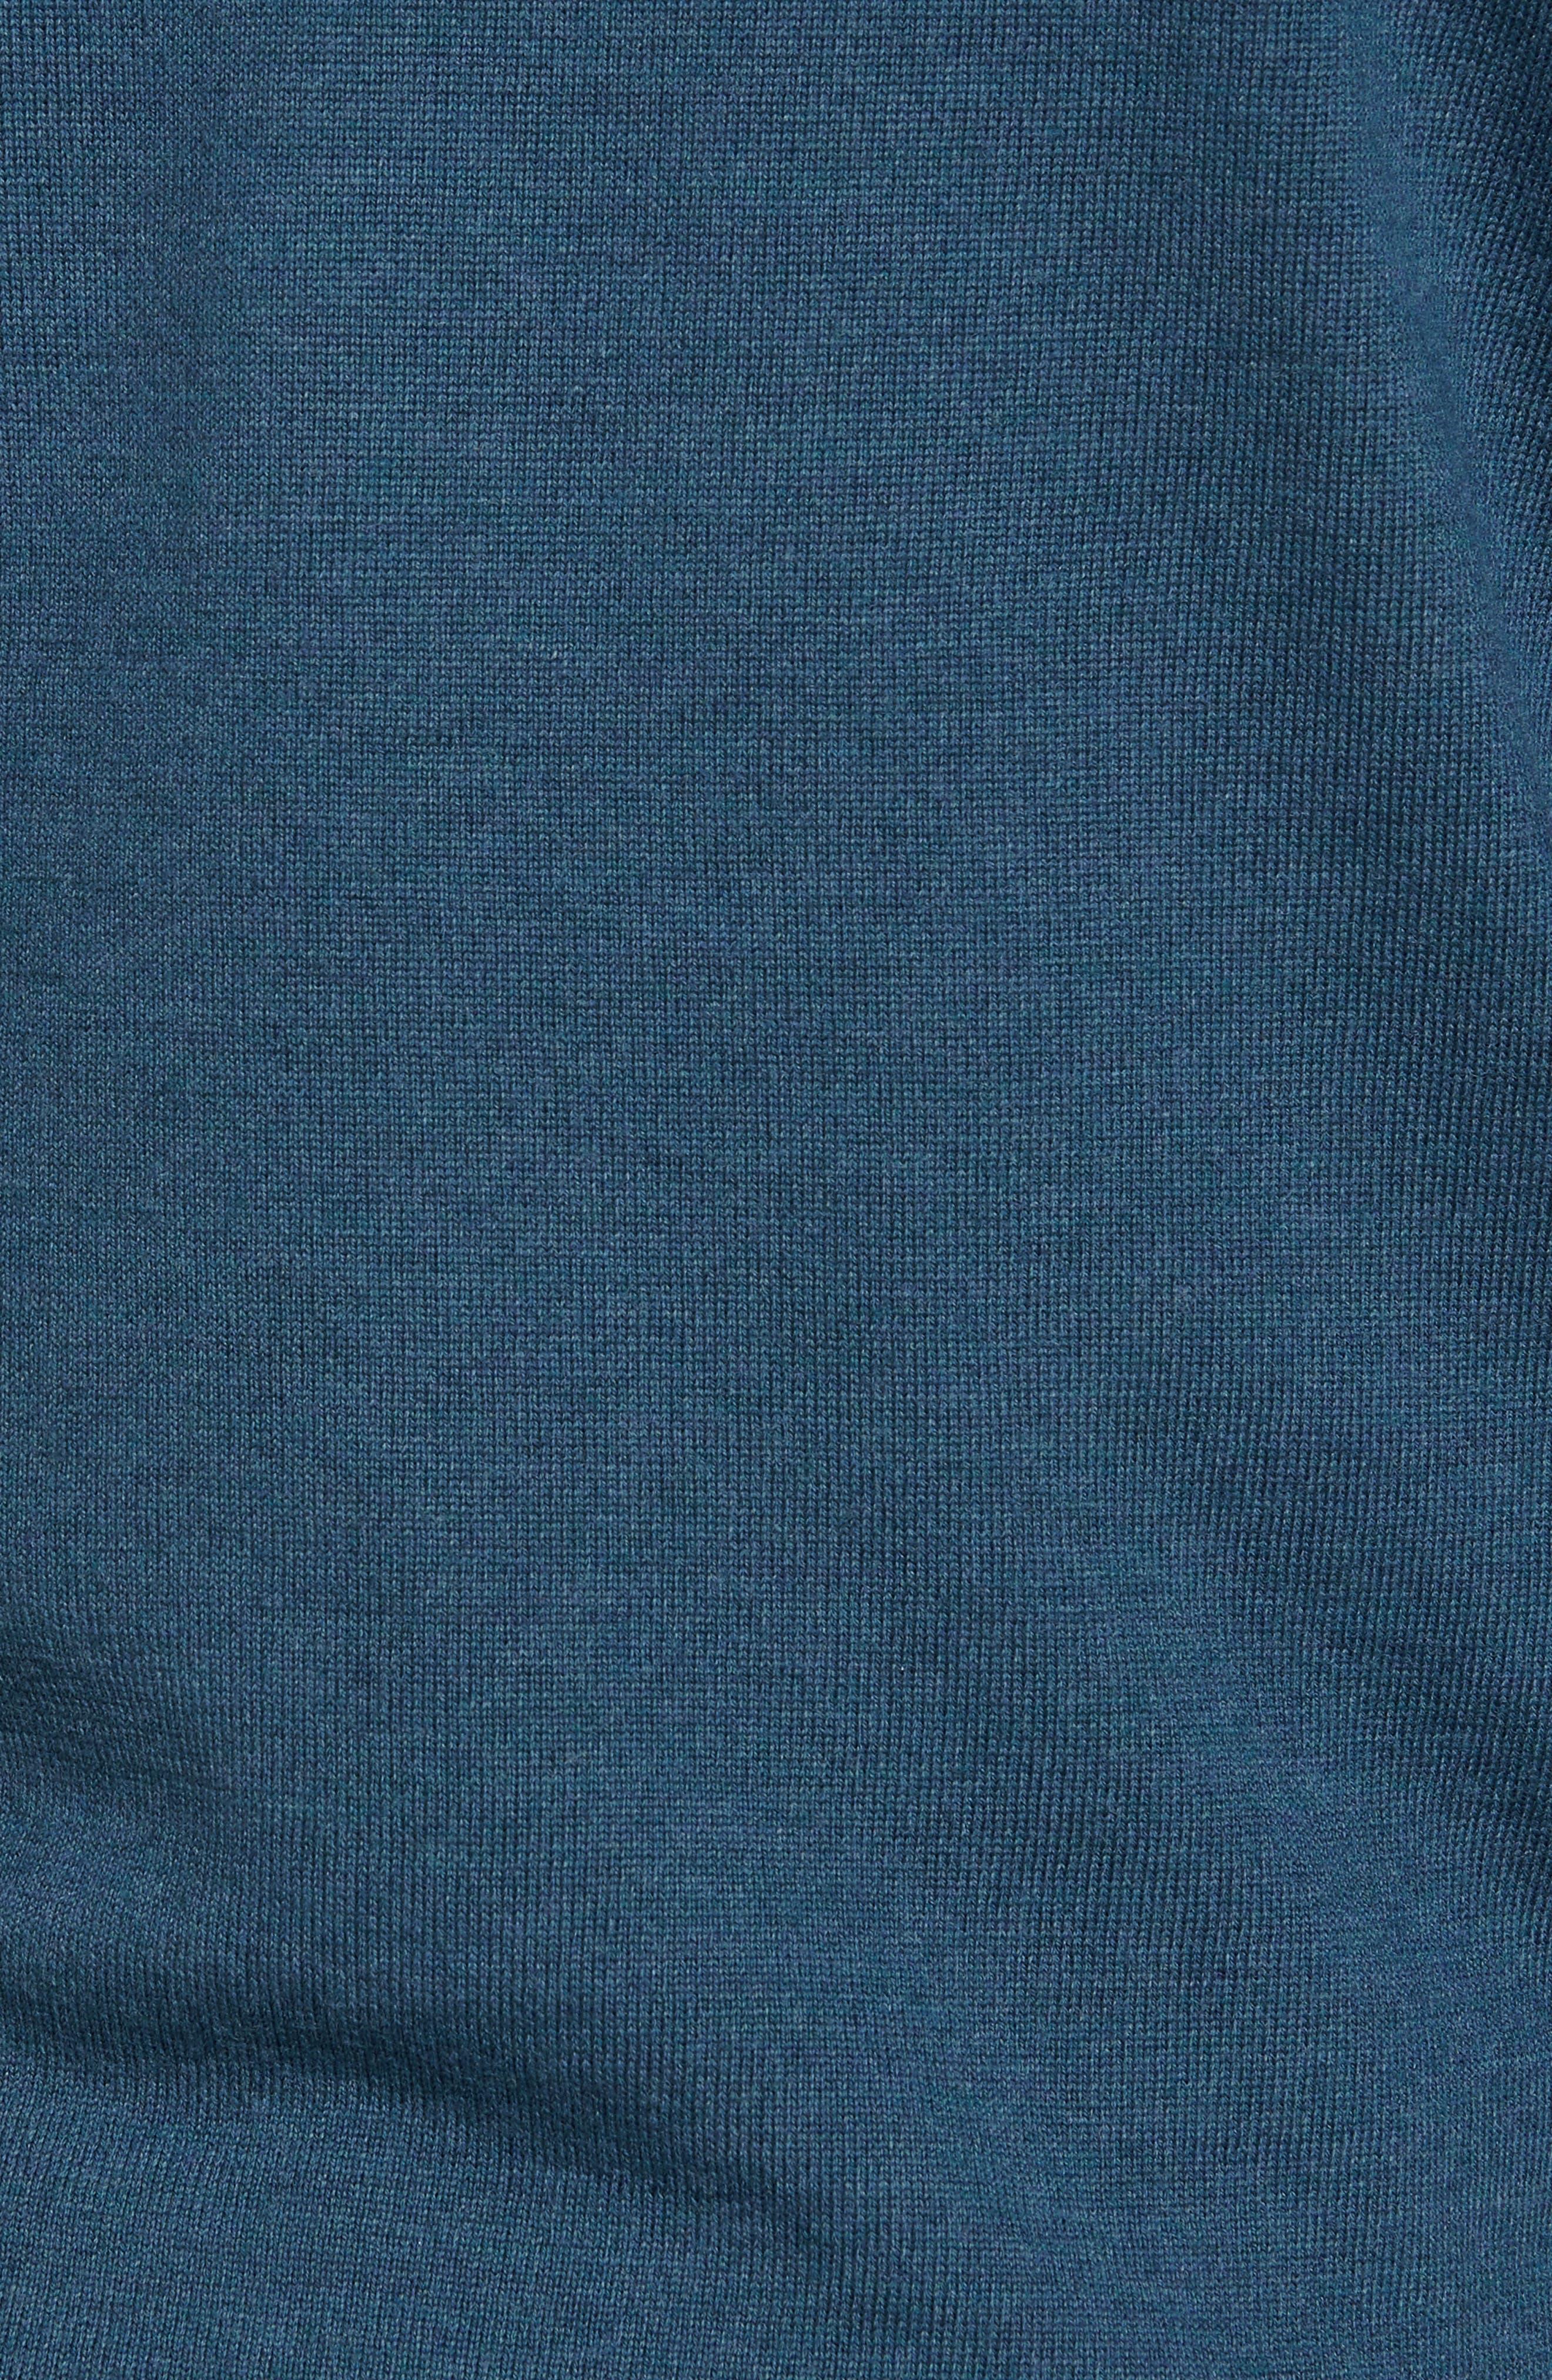 Alternate Image 5  - Nordstrom Men's Shop V-Neck Merino Wool Sweater (Regular & Tall)